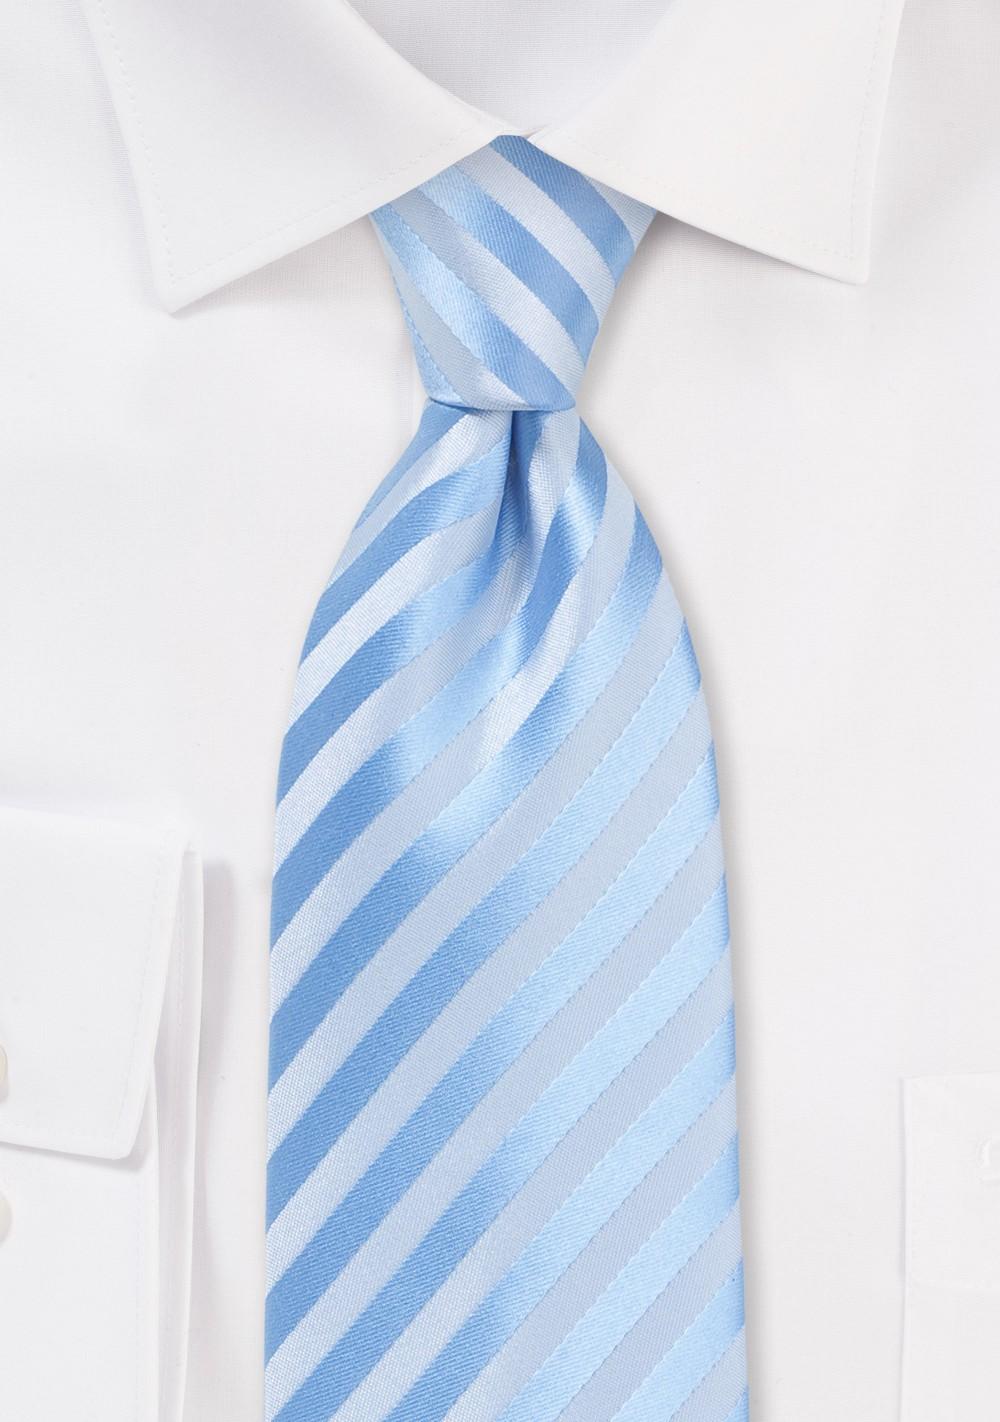 Capri Blue Striped Tie in XL Length